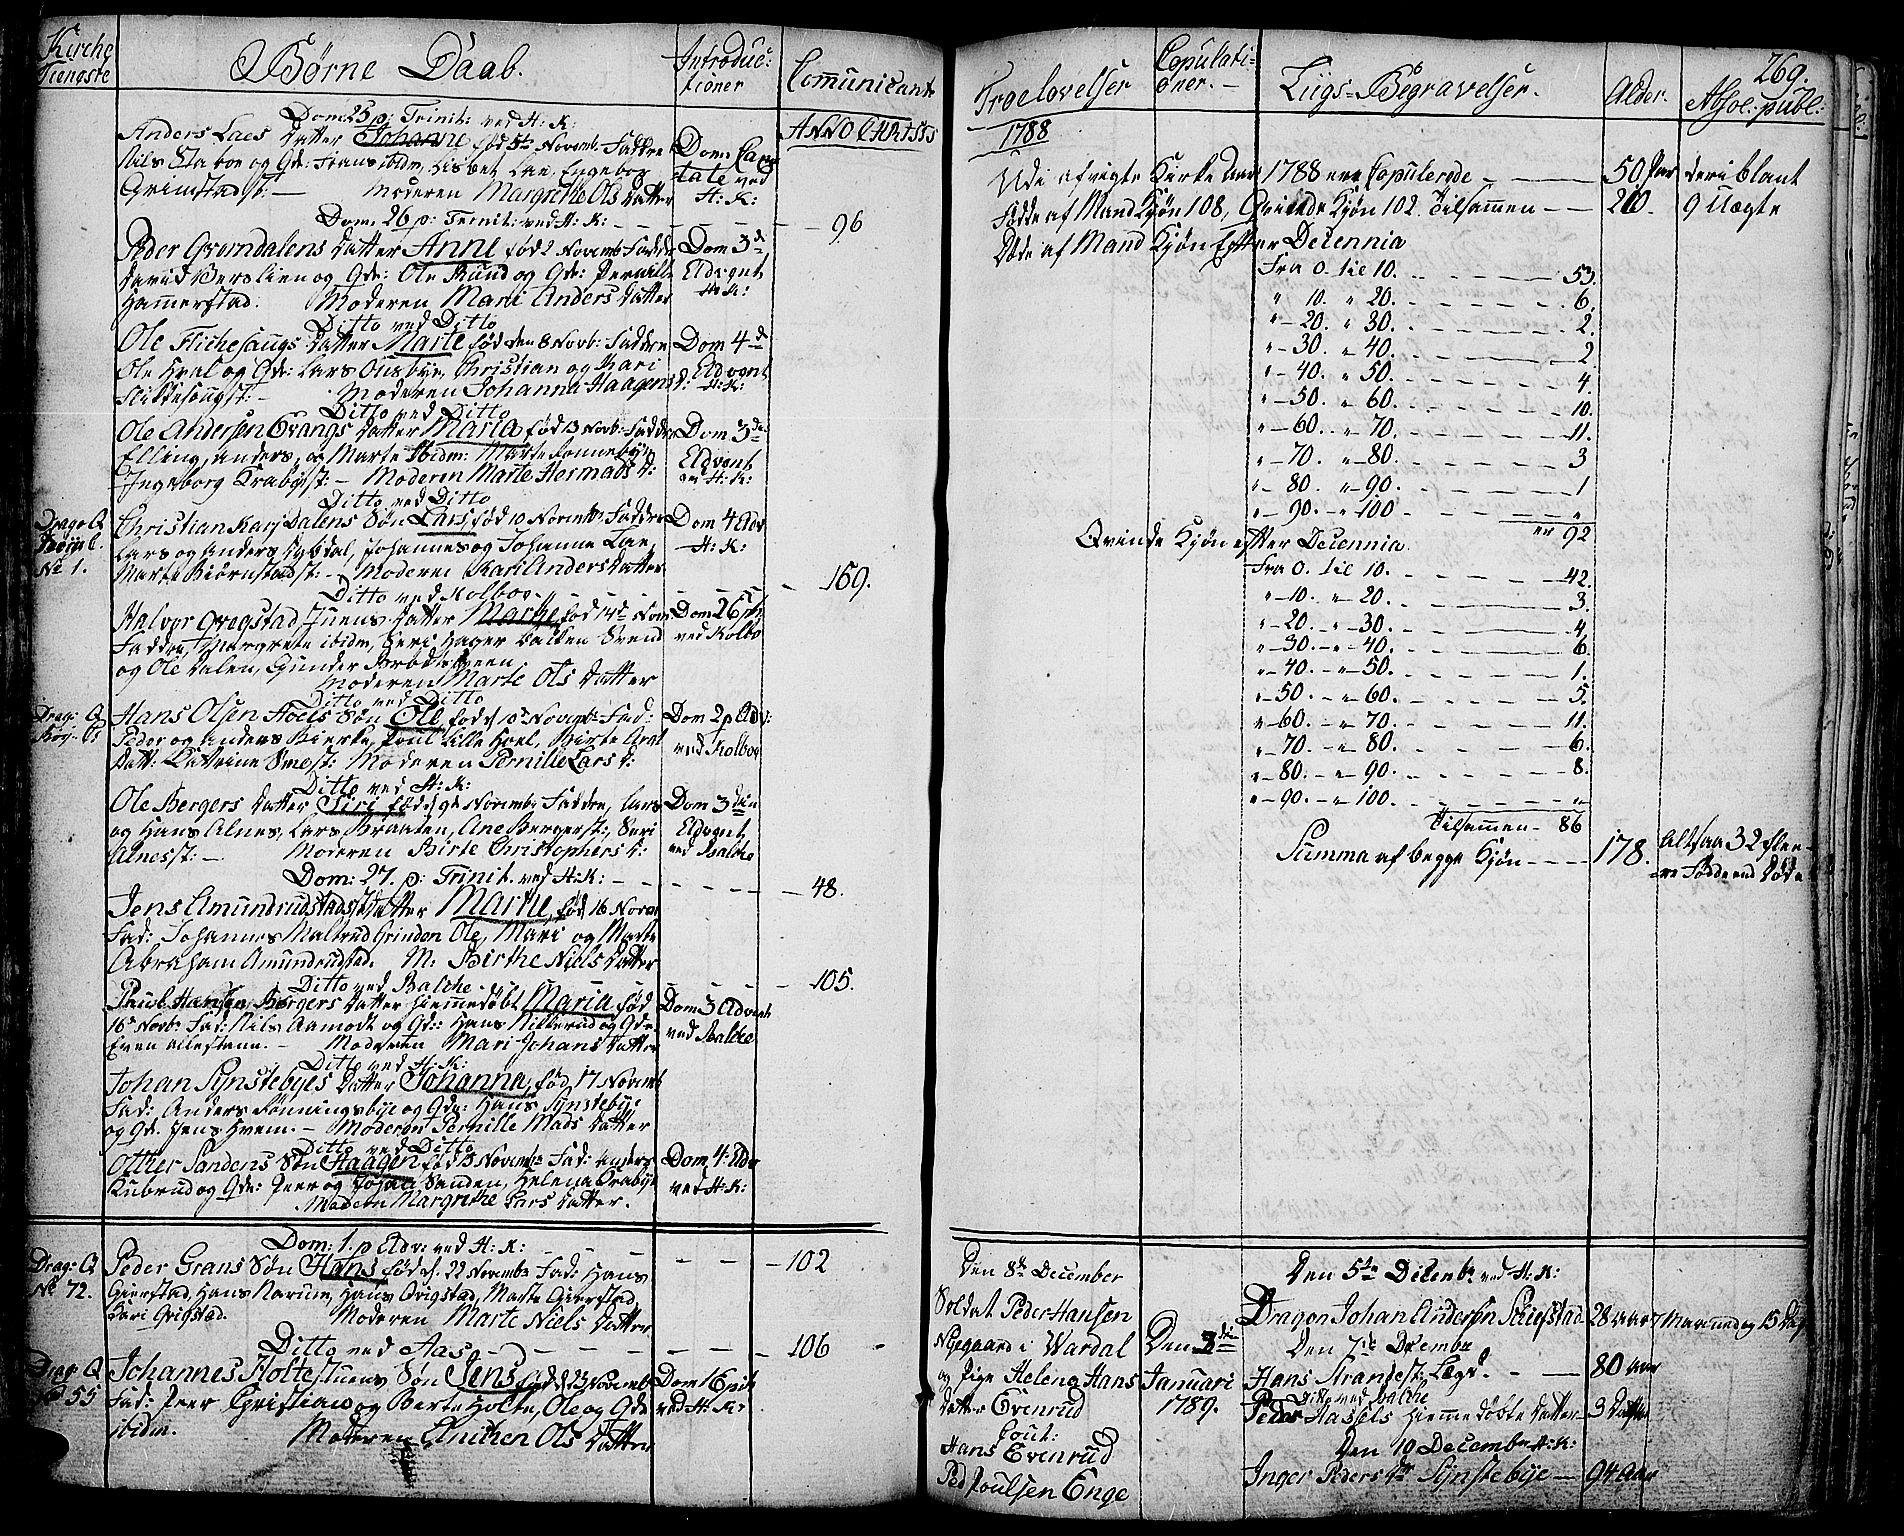 SAH, Toten prestekontor, Ministerialbok nr. 6, 1773-1793, s. 269